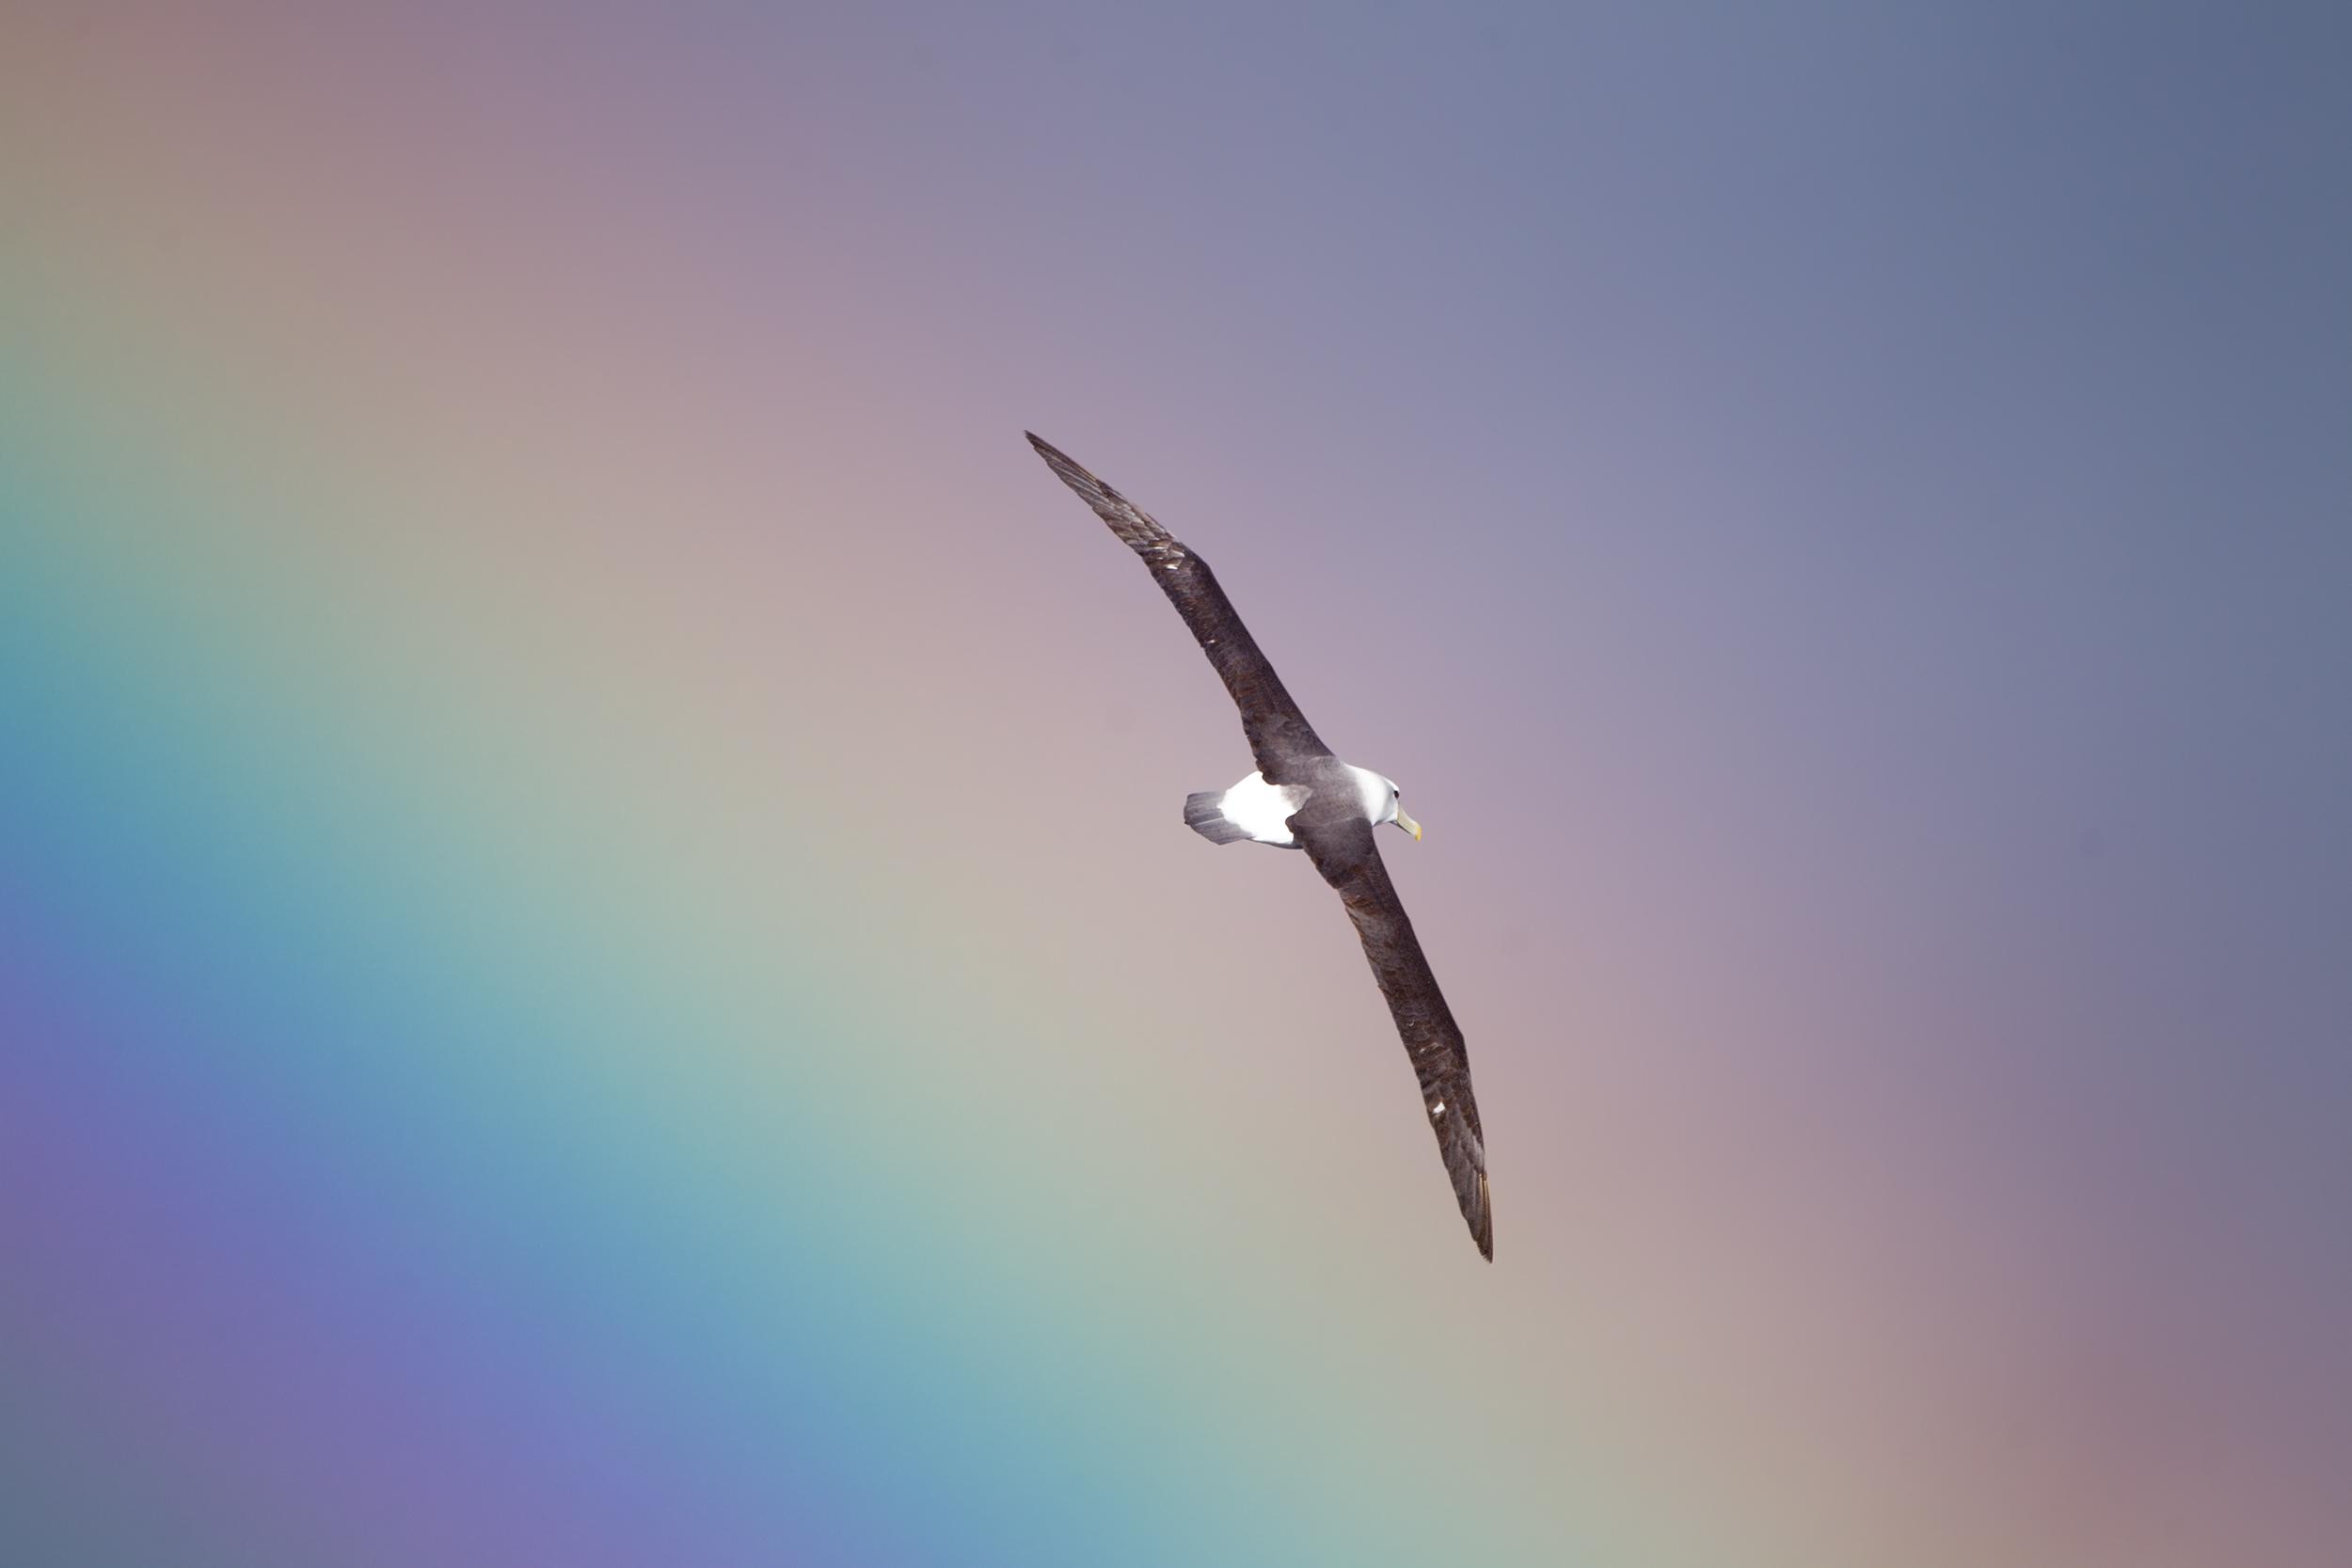 Thalassarche_cauta_over_a_rainbow_-_SE_Tasmania